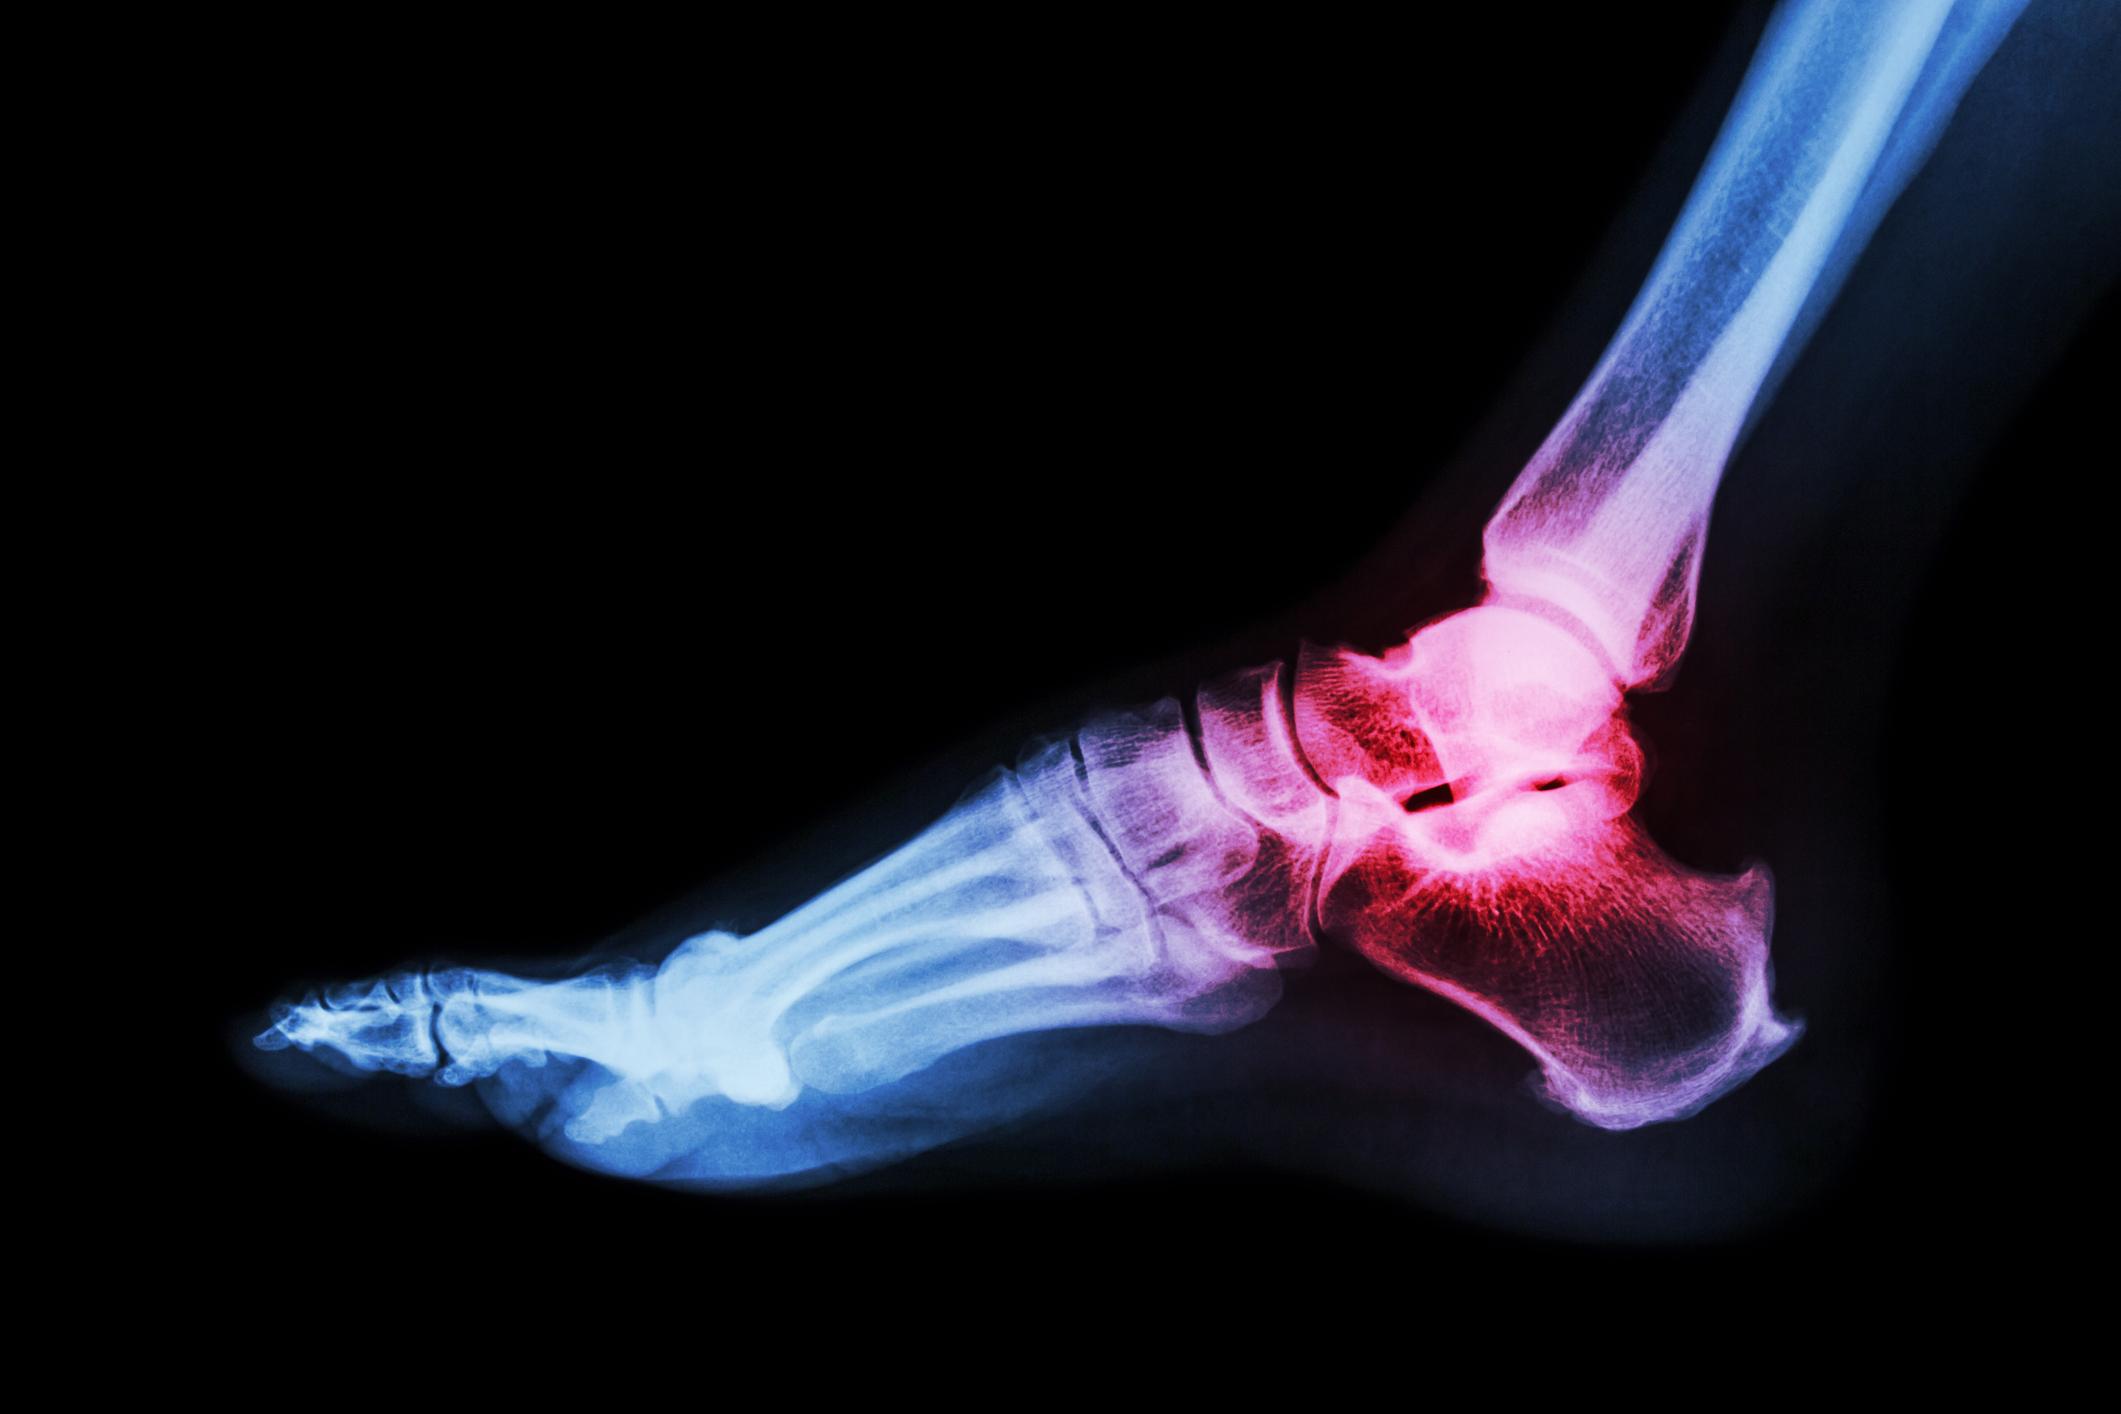 Steven L. Shapiro, MD - Savannah Orthopaedic Foot &Ankle